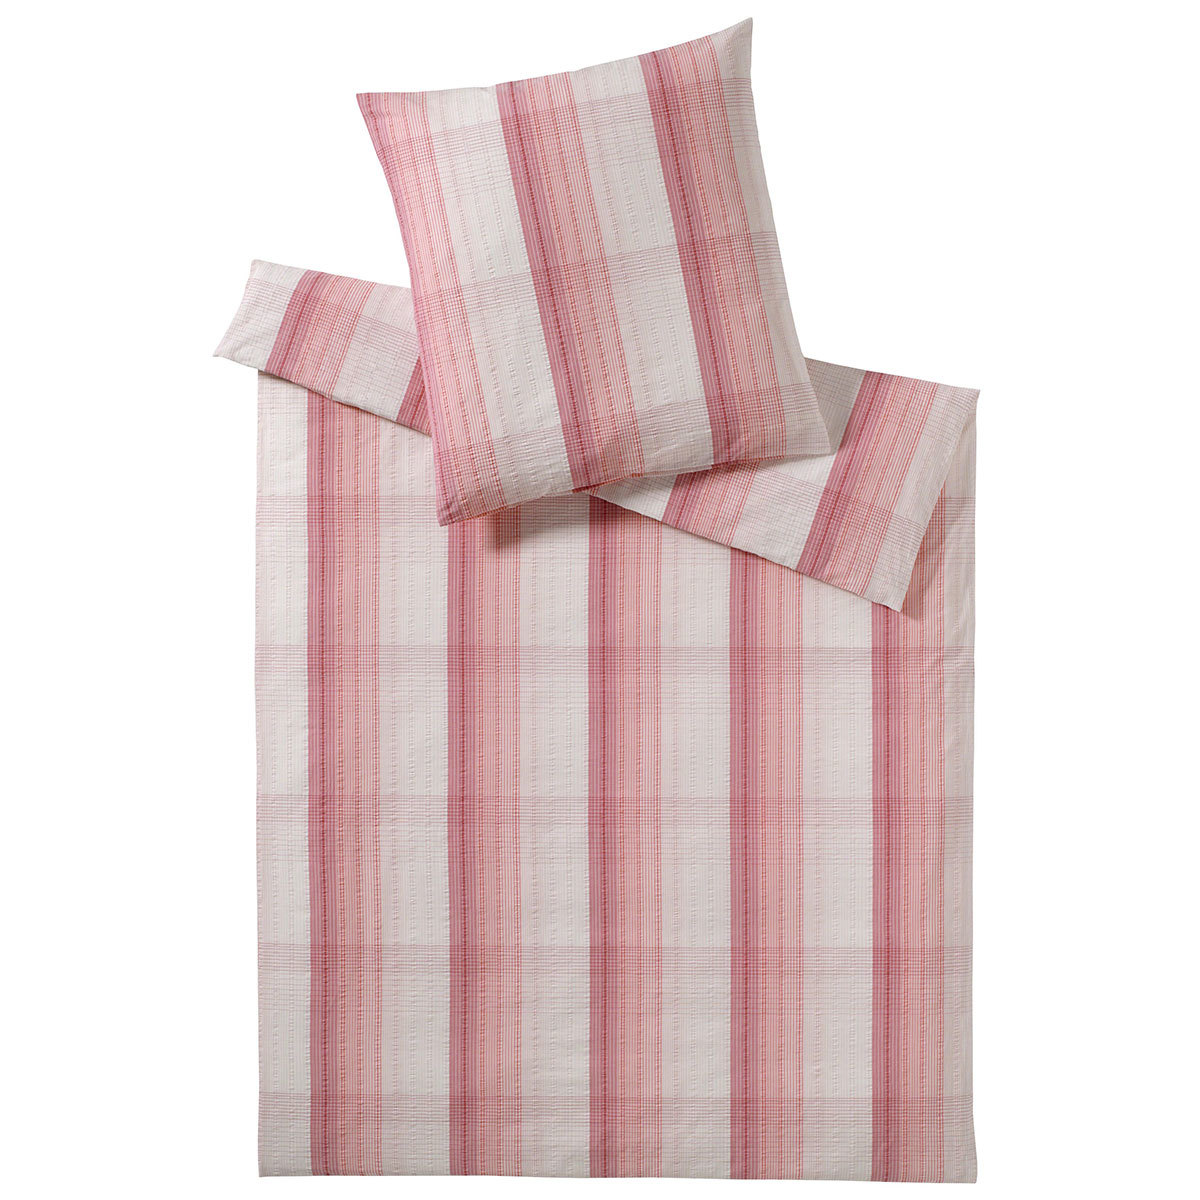 elegante seersucker bettw sche wembley rouge g nstig online kaufen bei bettwaren shop. Black Bedroom Furniture Sets. Home Design Ideas